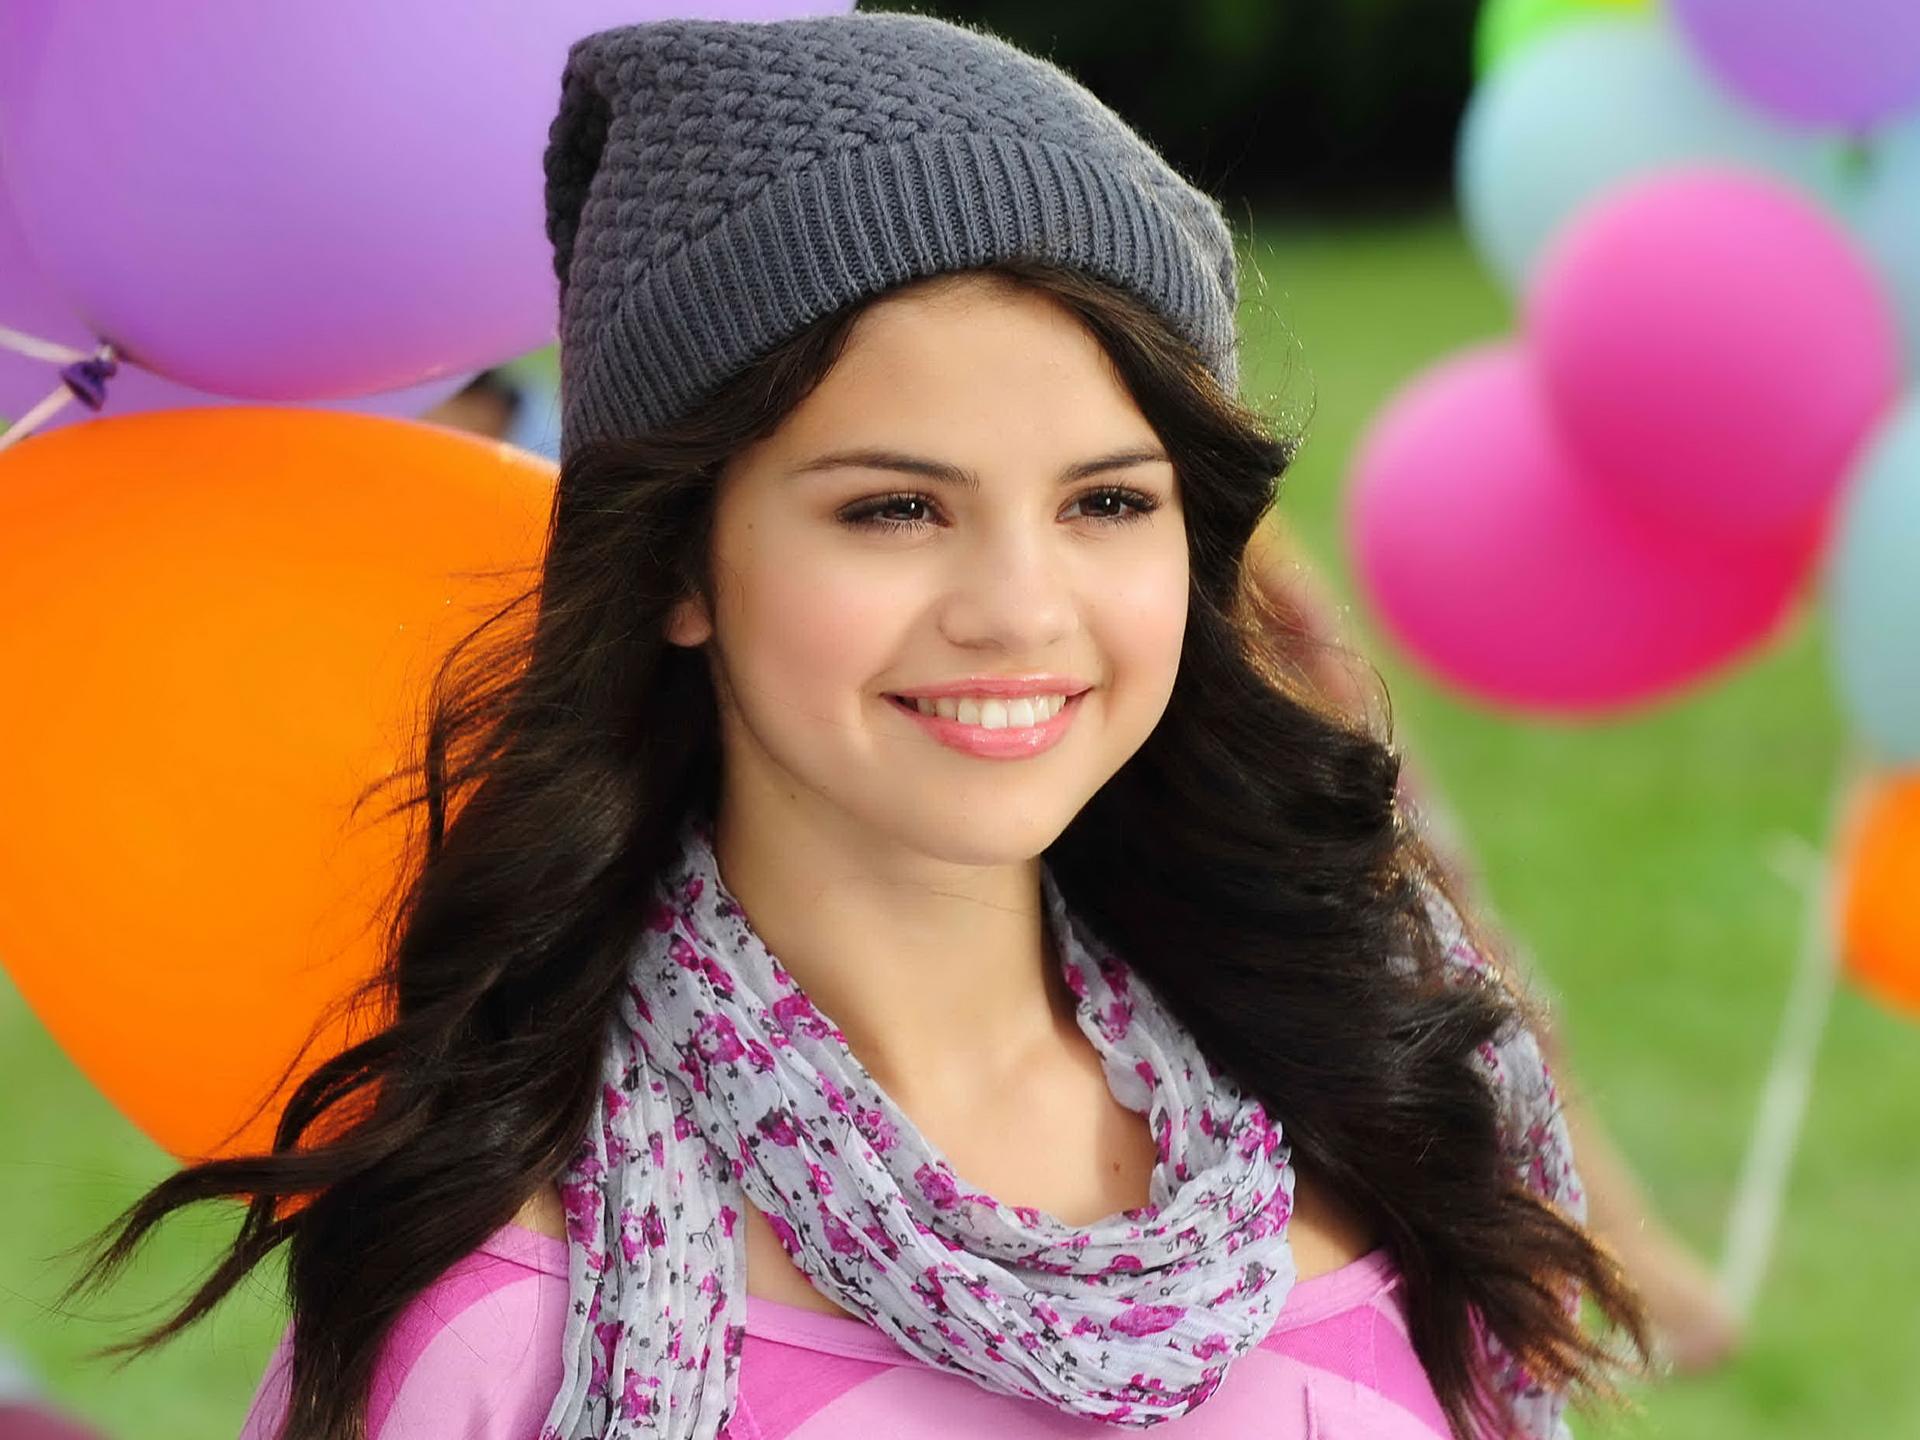 Selena Gomez celebrates her 24th birthday today (22 July 2016) ADRIAN  SANCHEZ-GONZALEZ/AFP/Getty Images